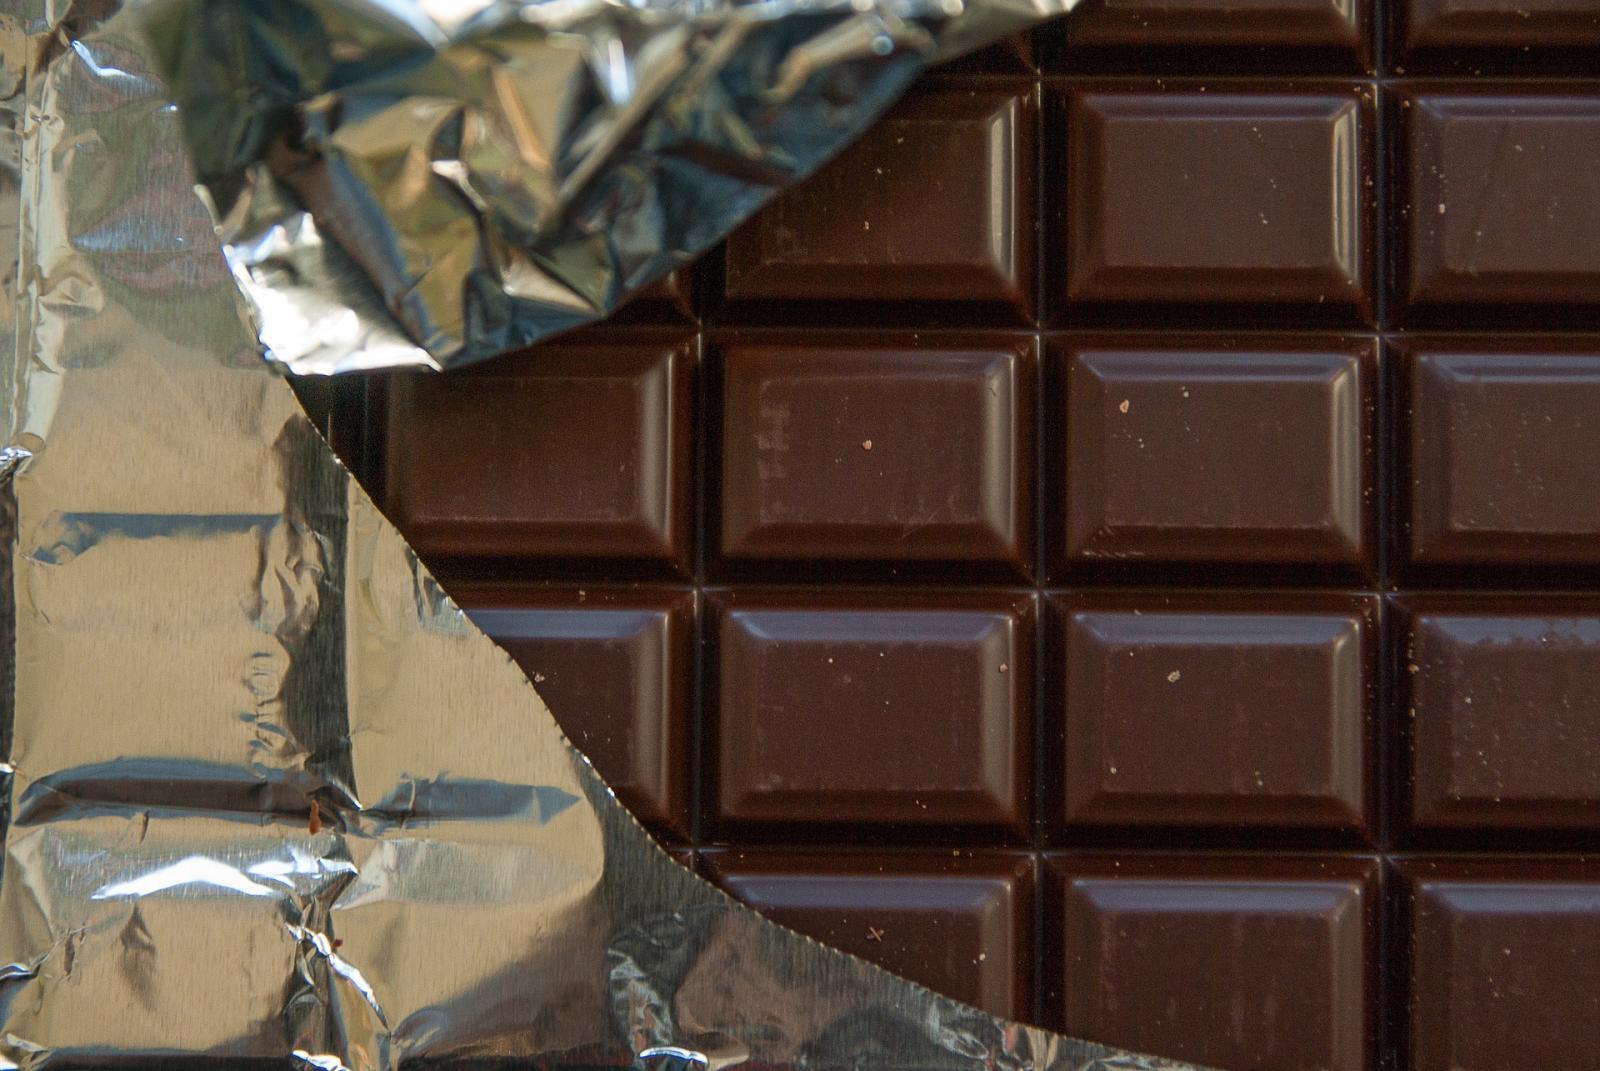 Dark chocolate. Photo credit: Pixabay